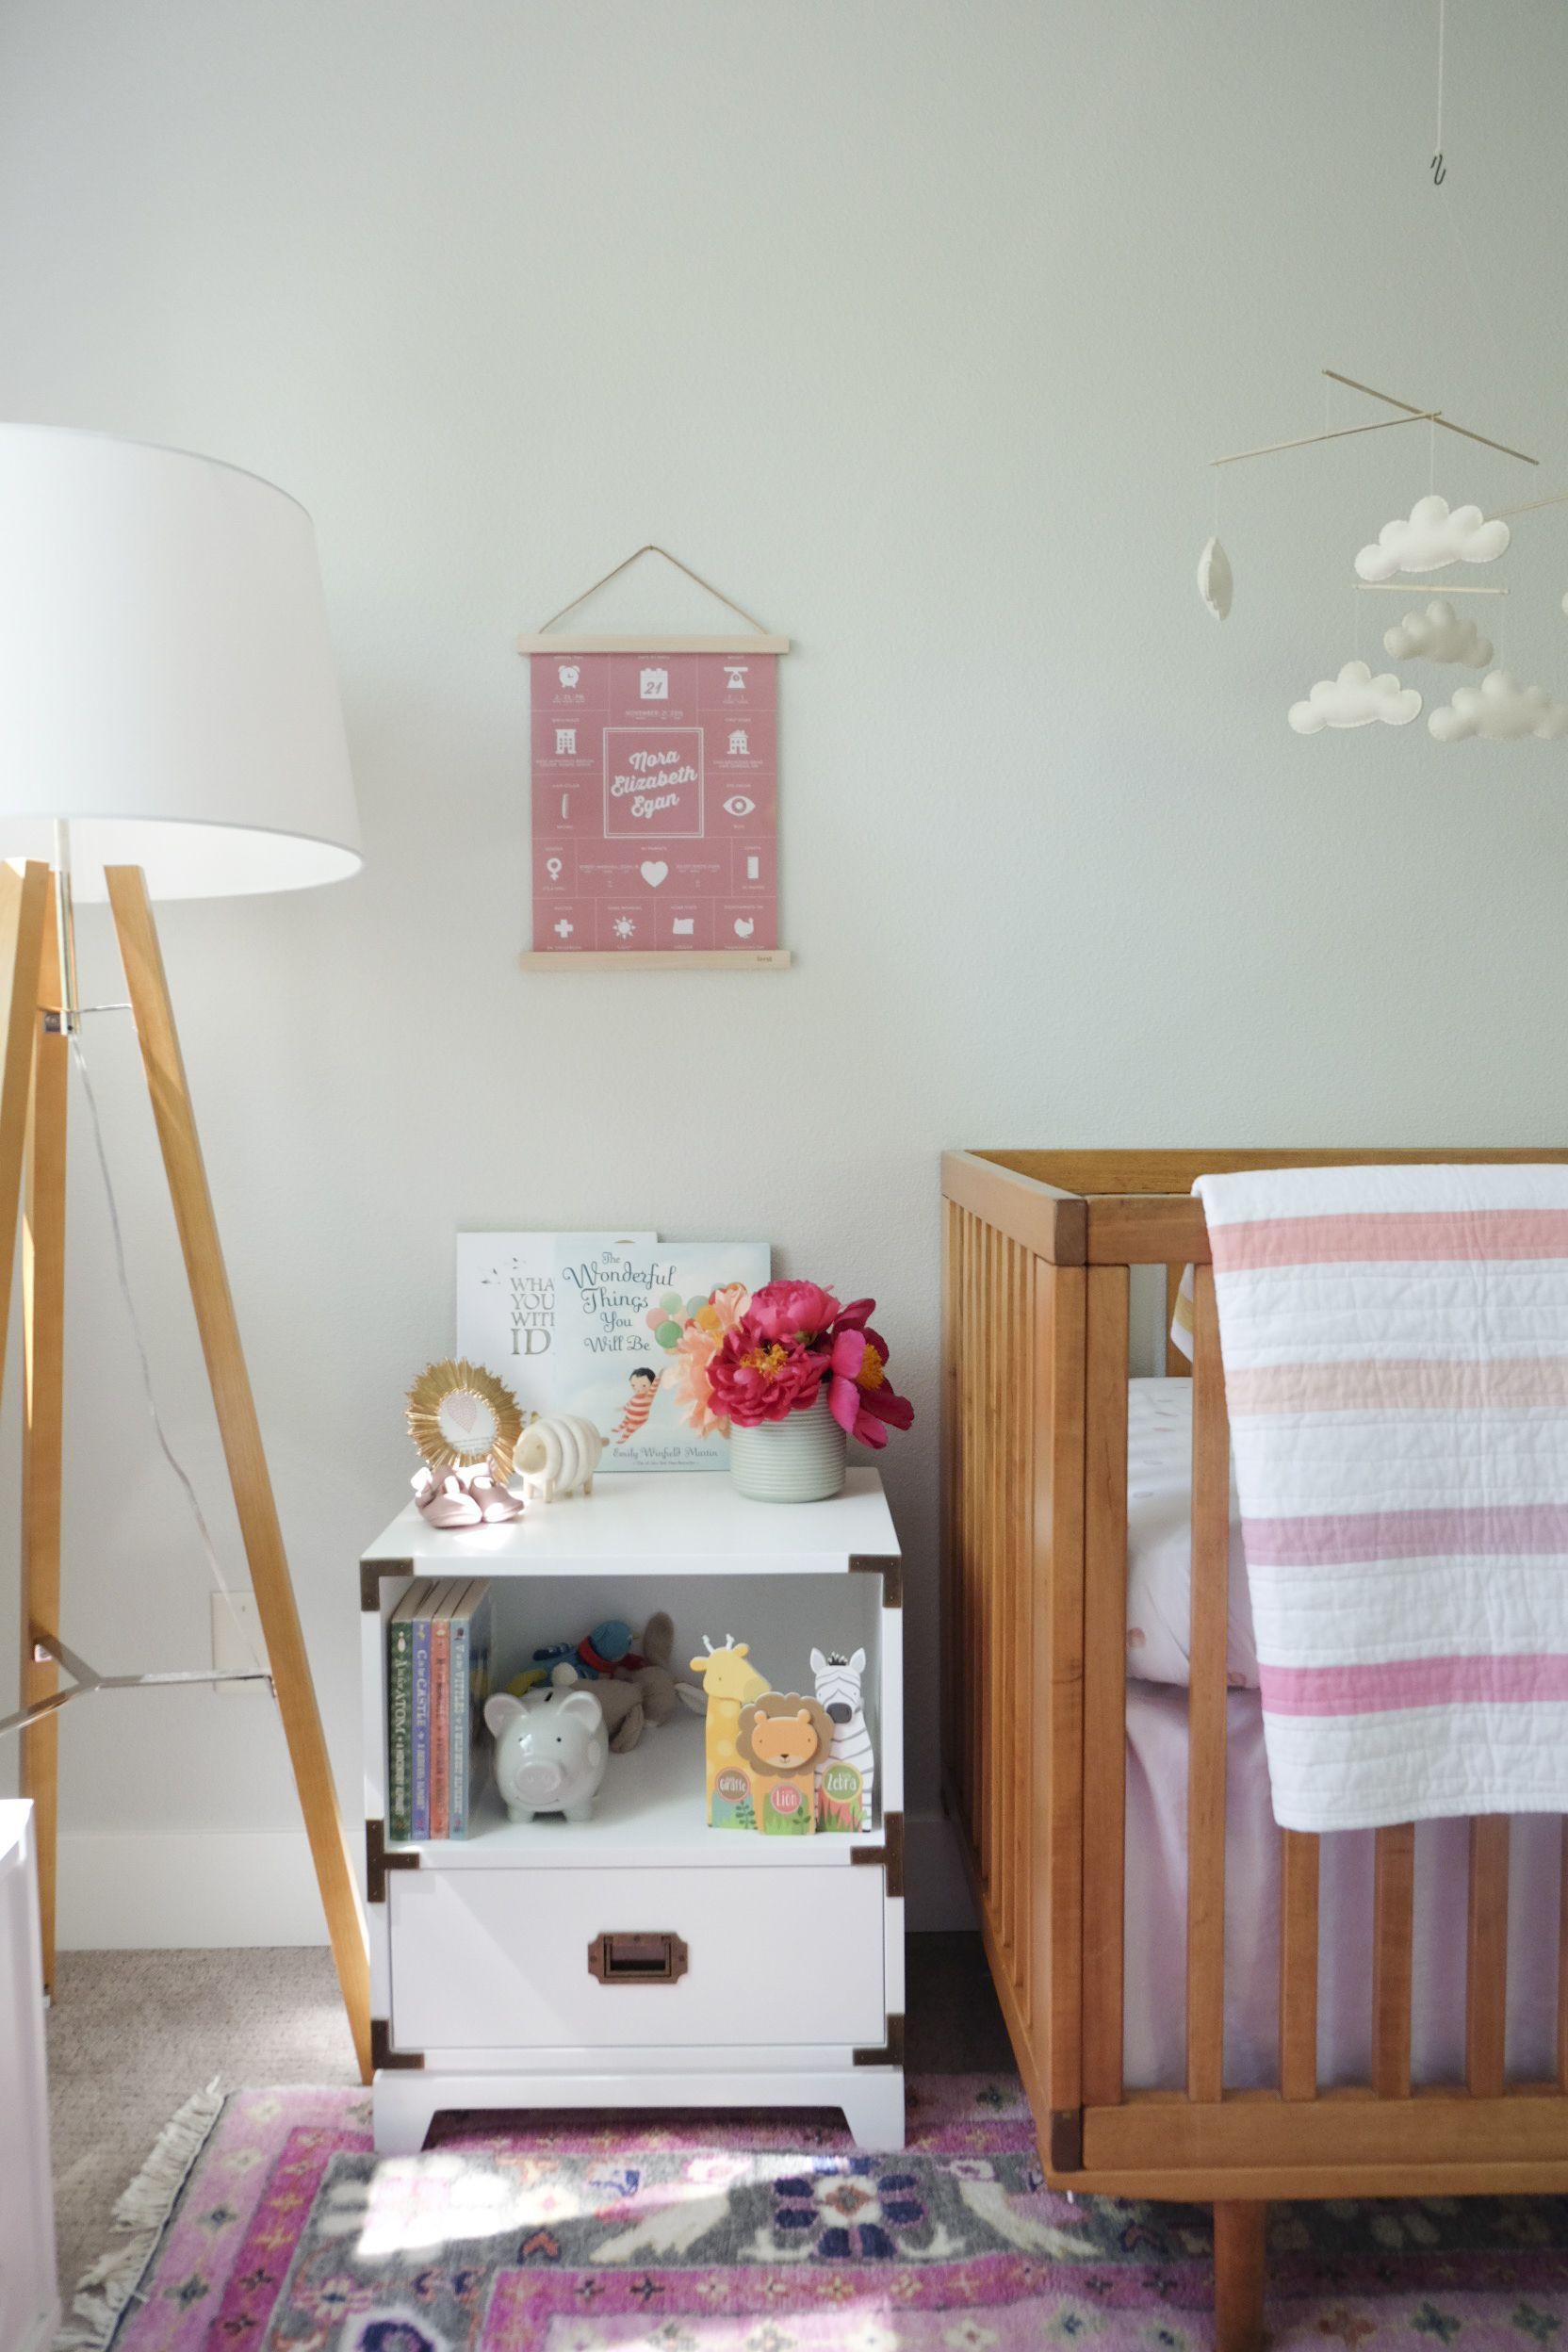 Design Your Own Bedroom Game Kids Room Makeovers Boho Nursery & Boys Room  Book Ledge